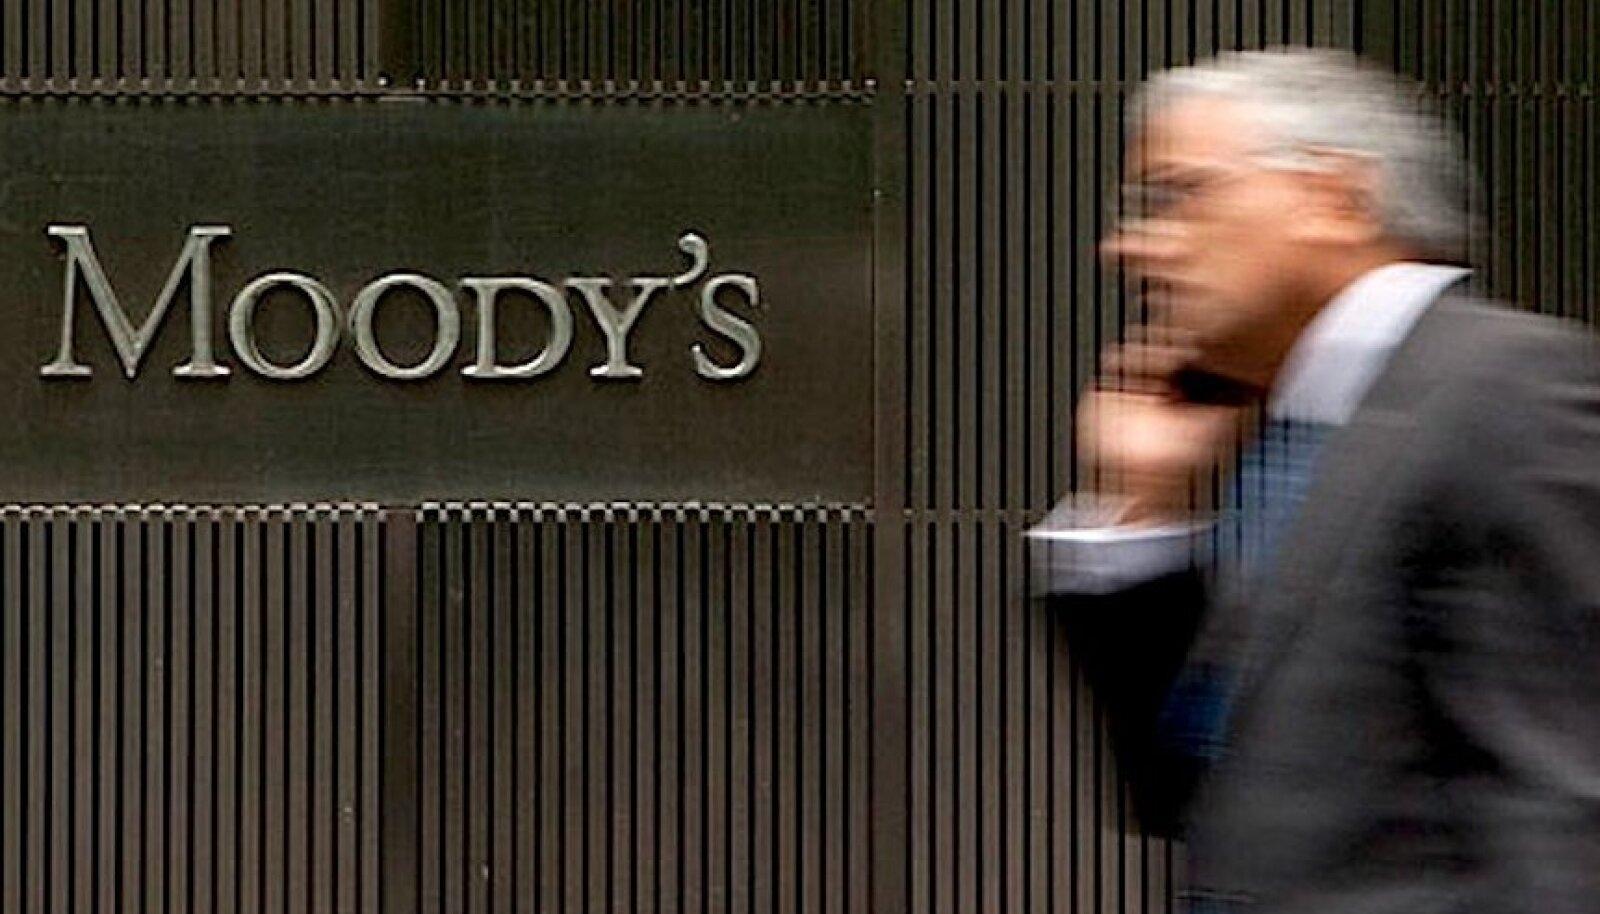 Reitinguagentuur Moody's